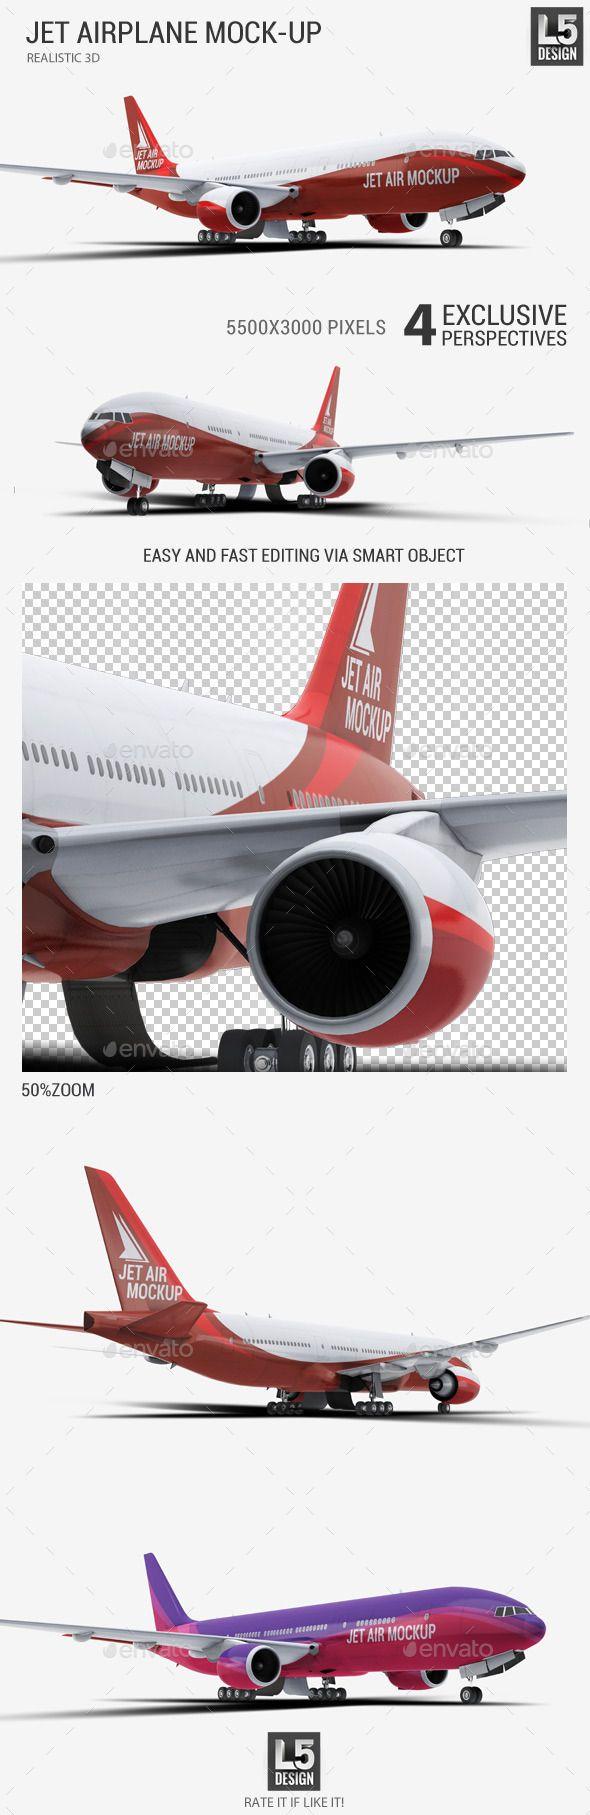 Jet Airplane Mock Up Mockup Mockup Design Airplane Design